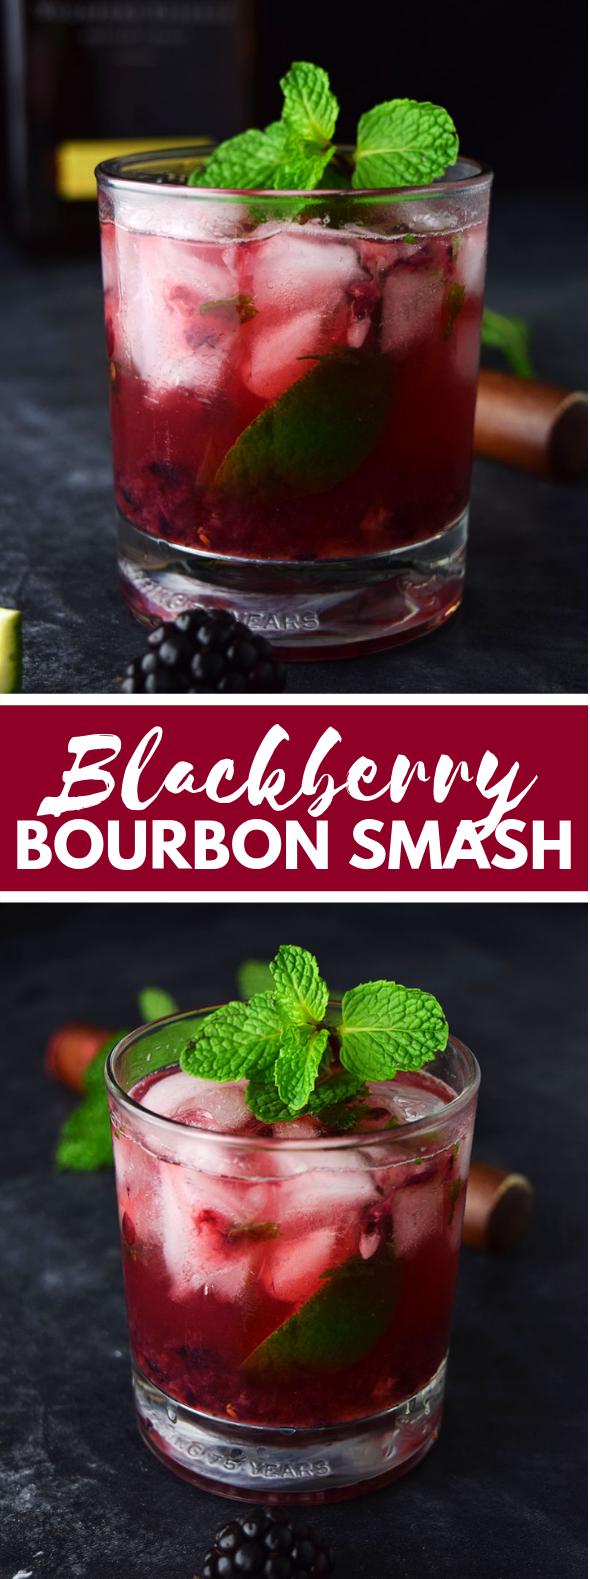 Blackberry Bourbon Smash (Whiskey Smash Recipe) #cocktails #drinks